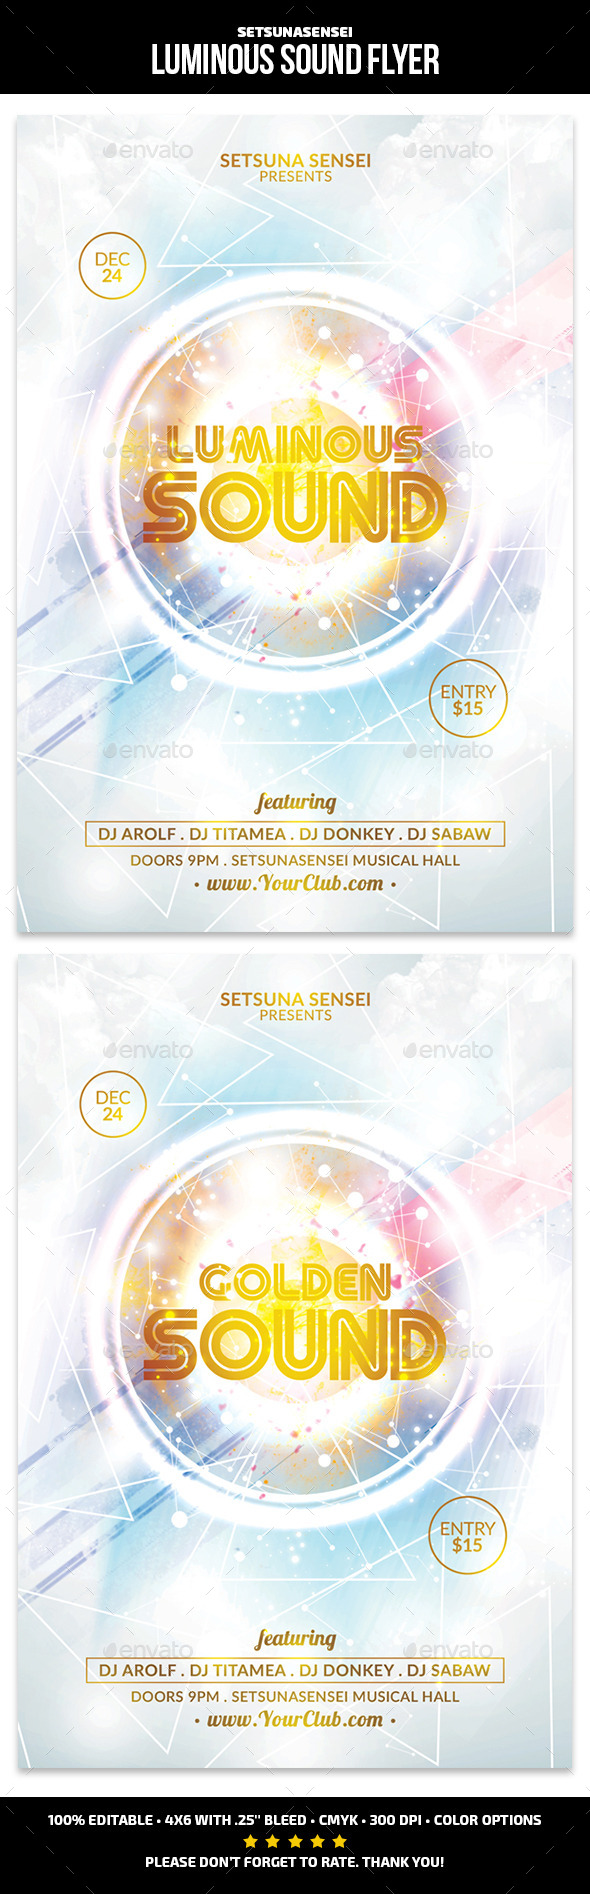 Luminous Sound Flyer - Clubs & Parties Events